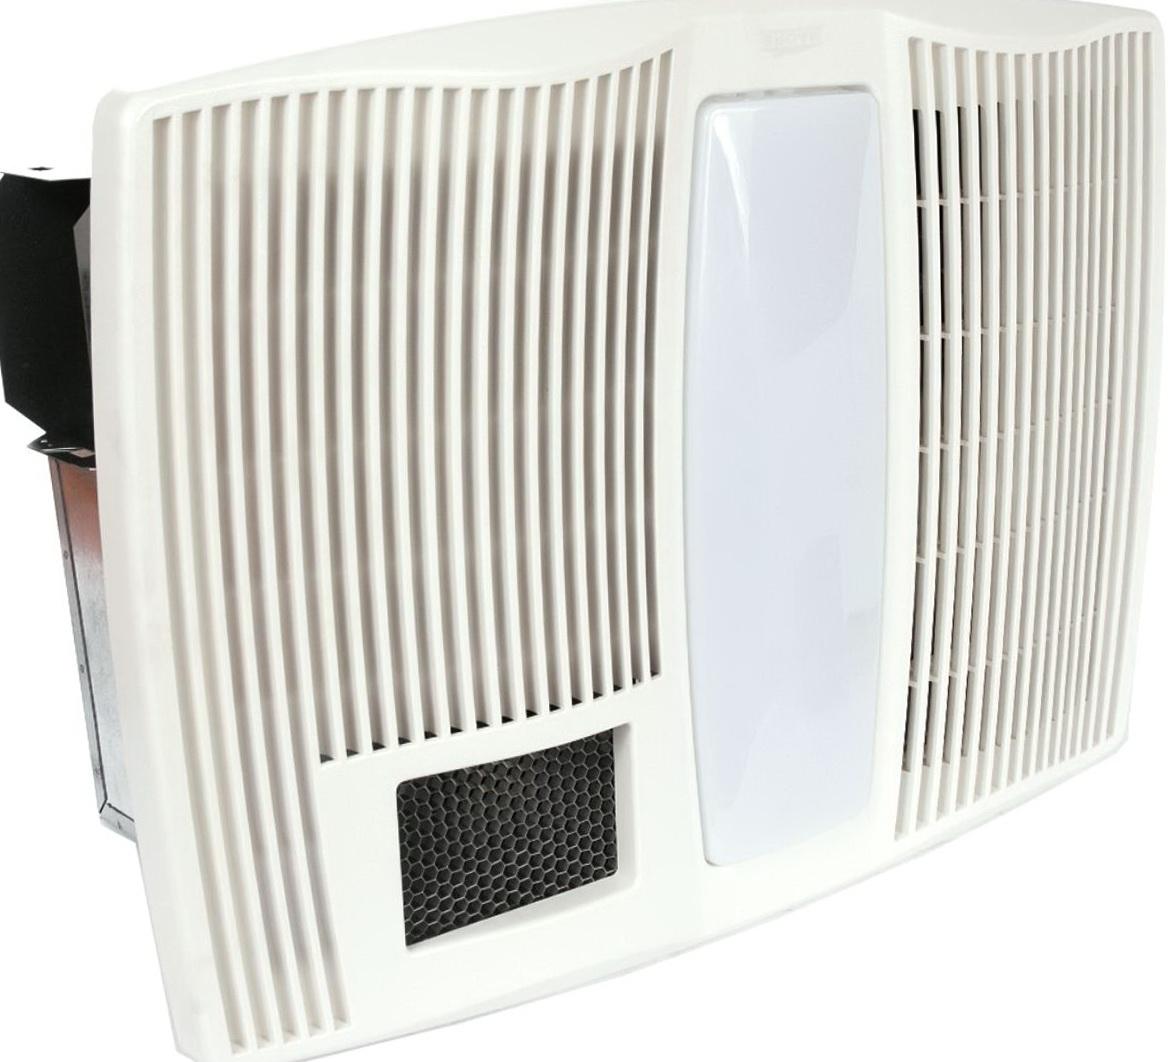 Nutone Bathroom Fan And Heater